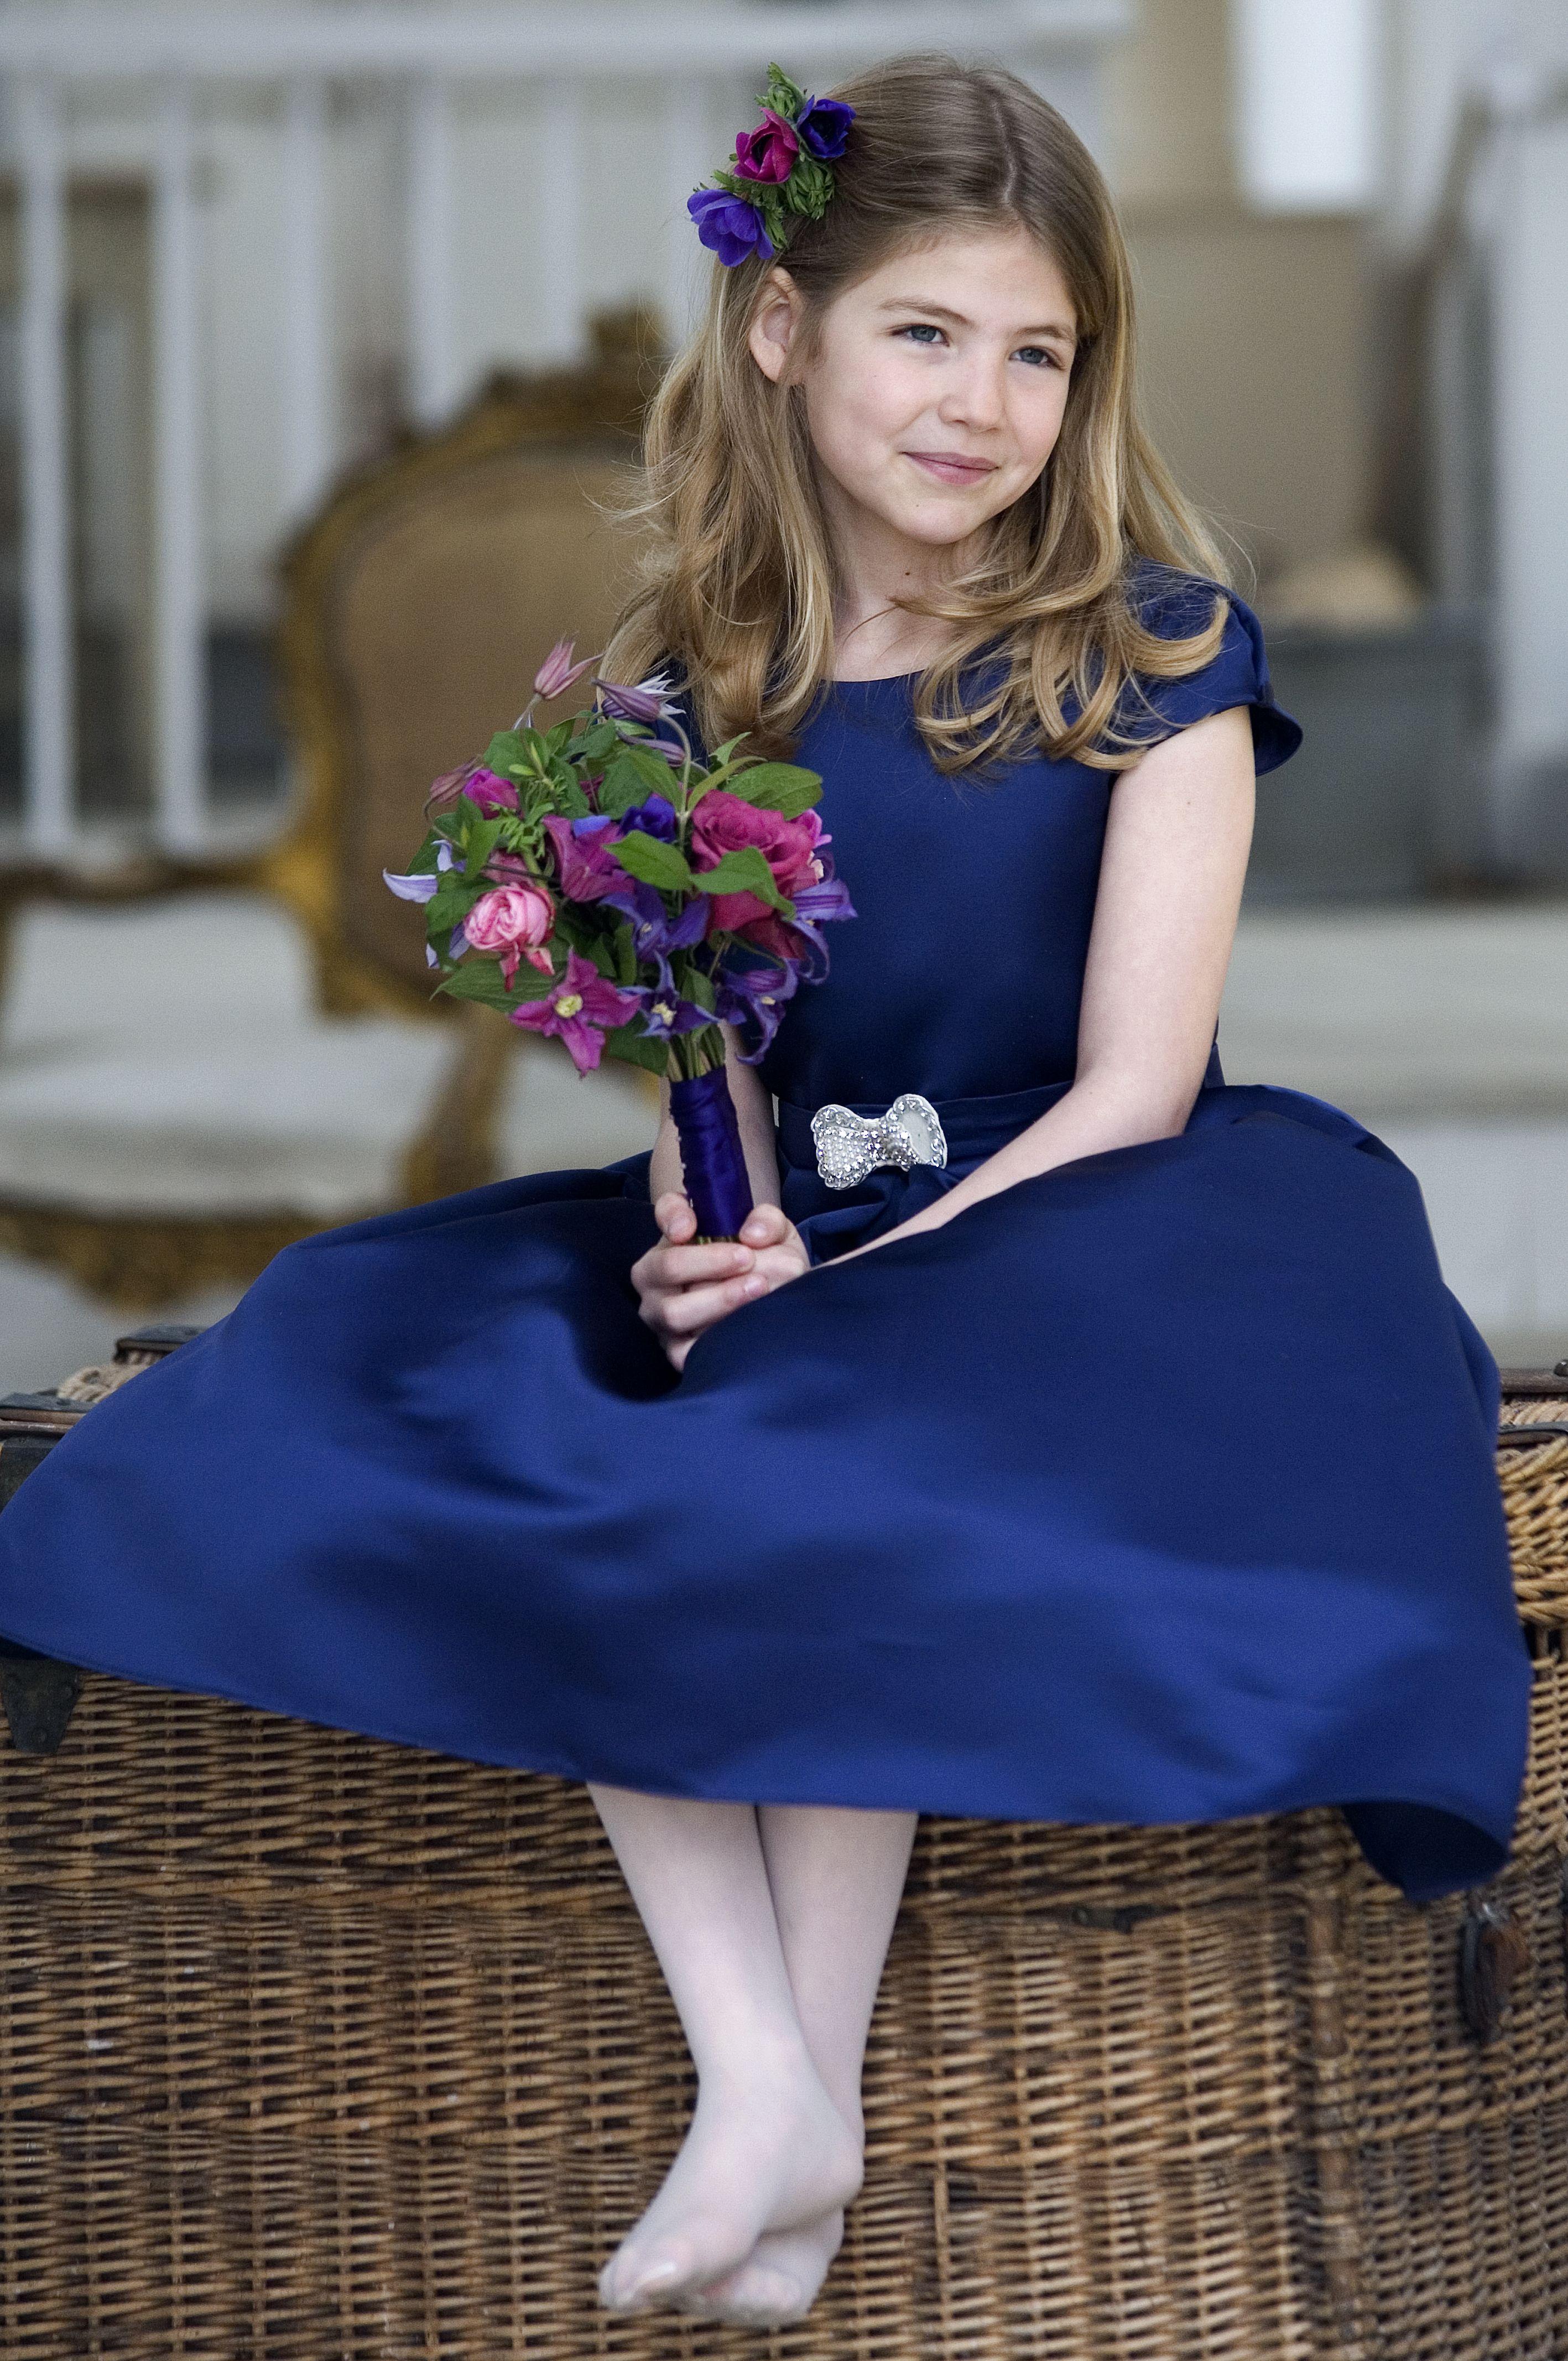 Blue satin flower girl or bridesmaid dress s style by designer